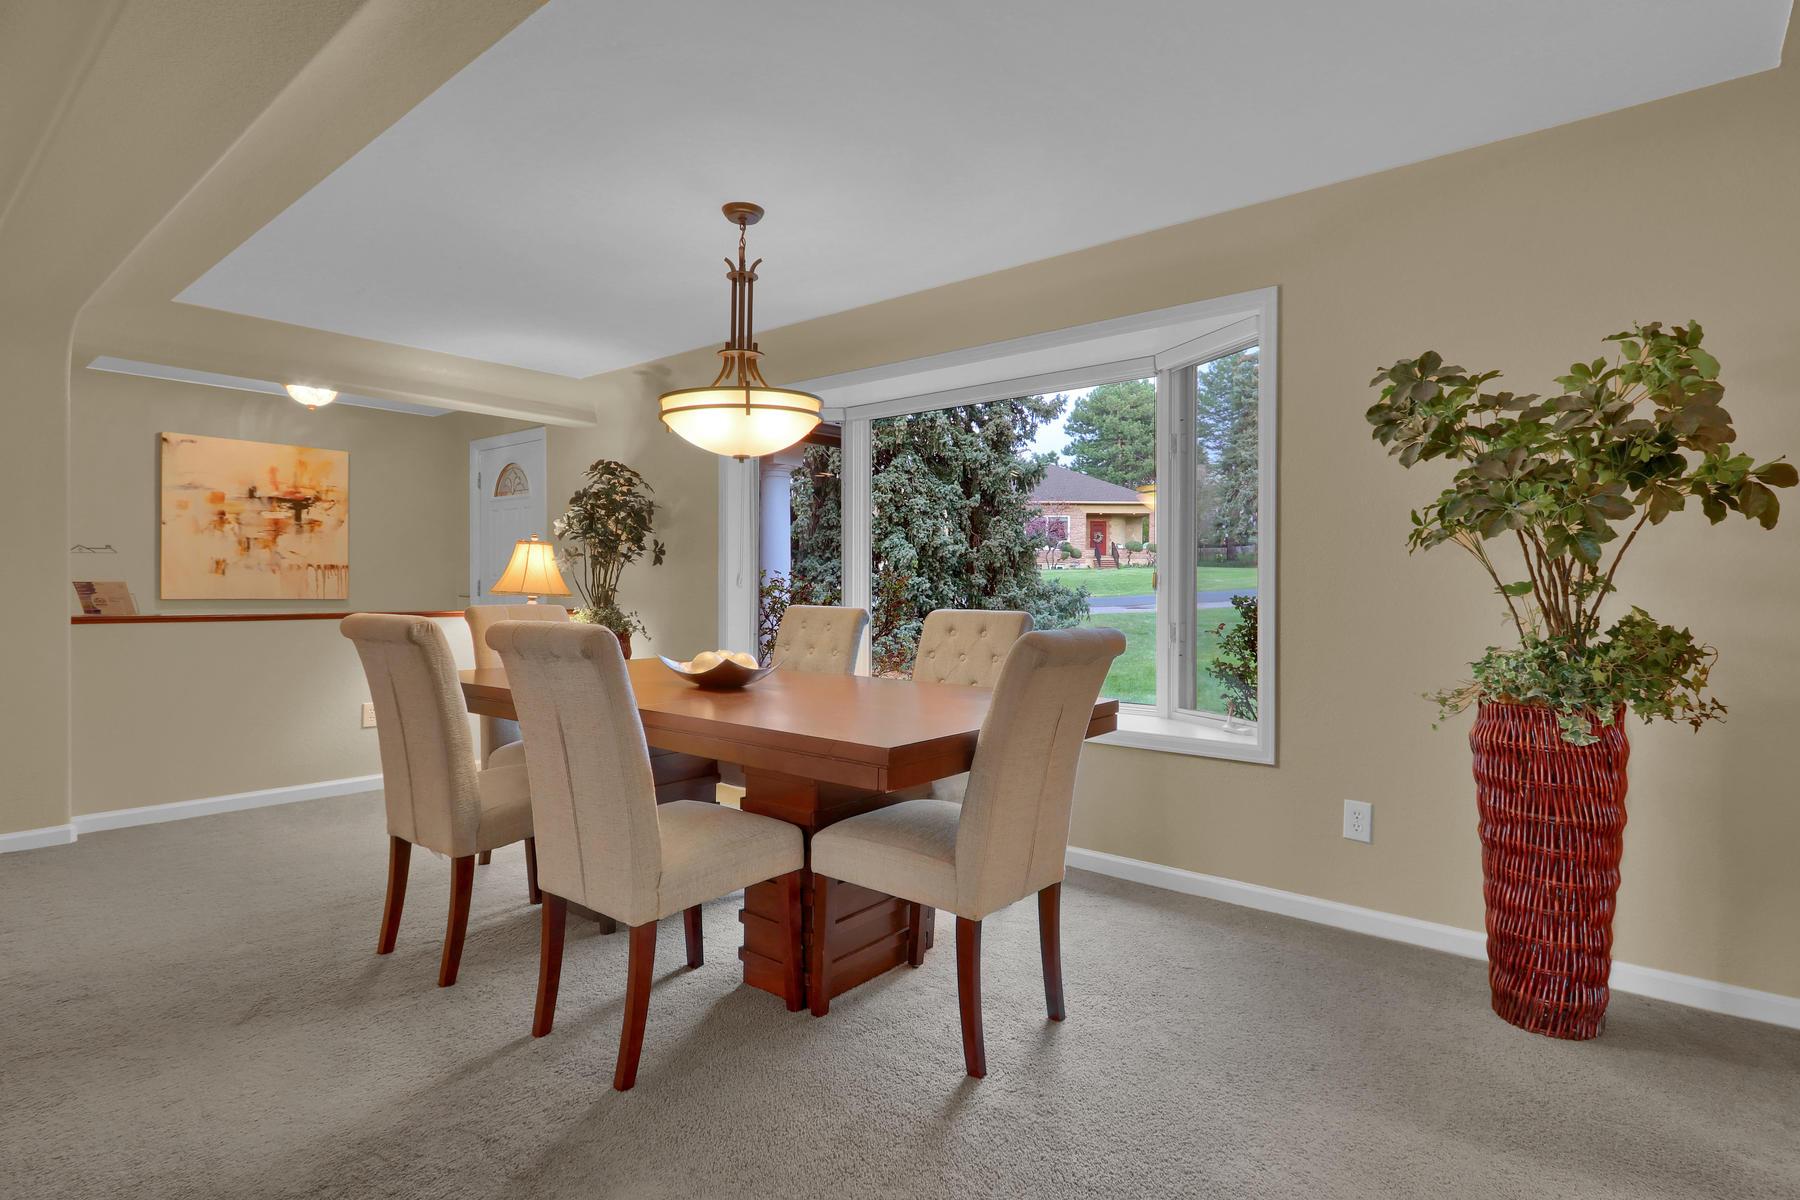 3845 Everett St Wheat Ridge CO-021-18-Dining Room-MLS_Size.jpg